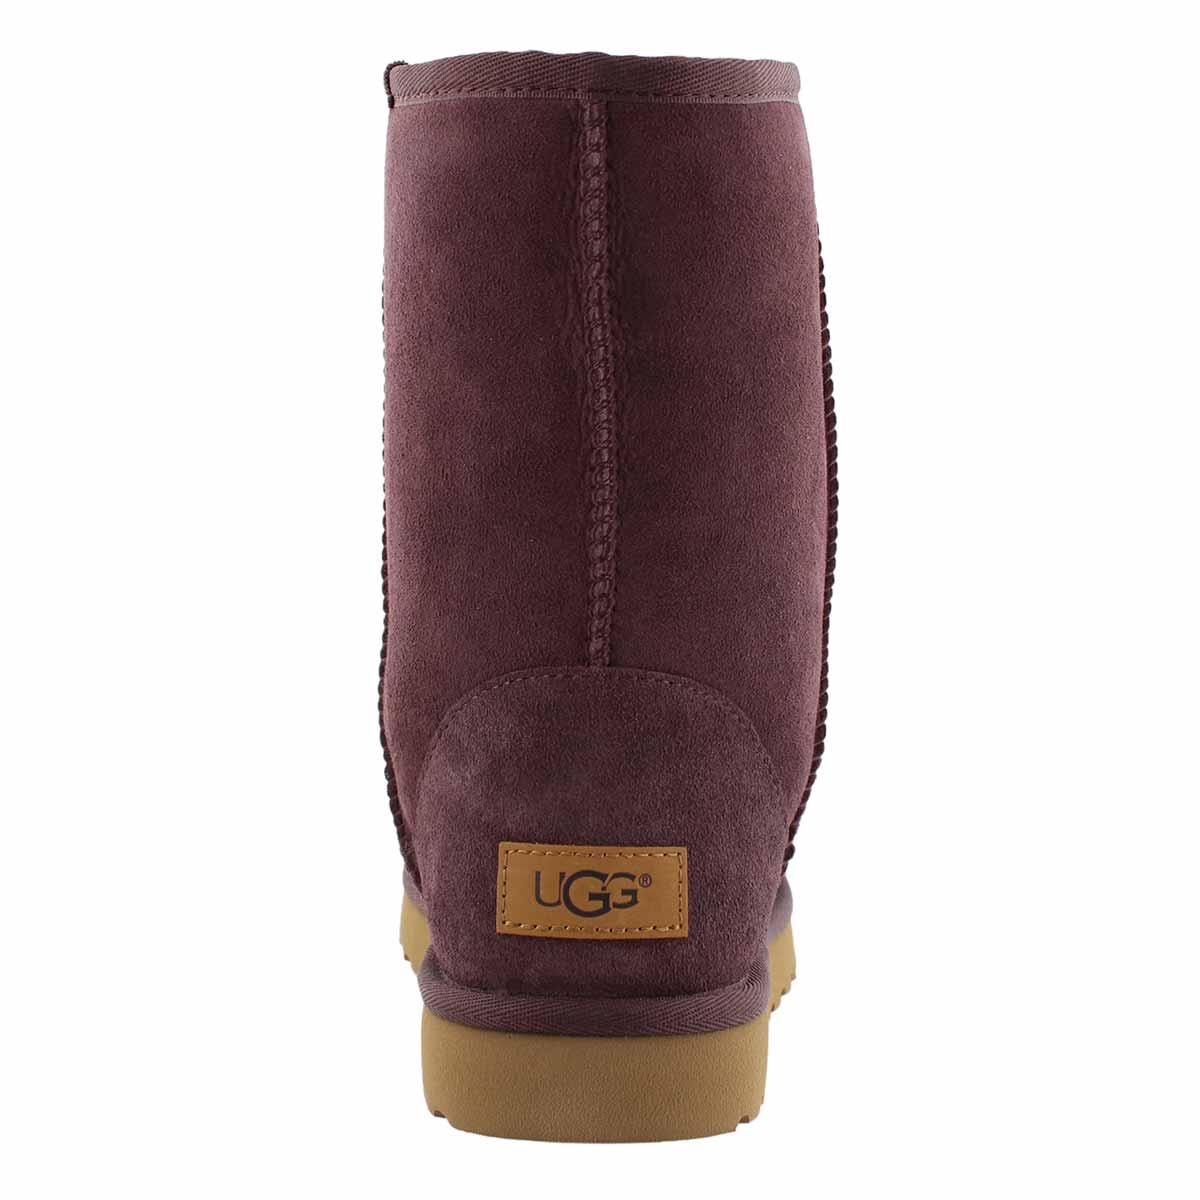 Lds Classic Short II port sheepskin boot